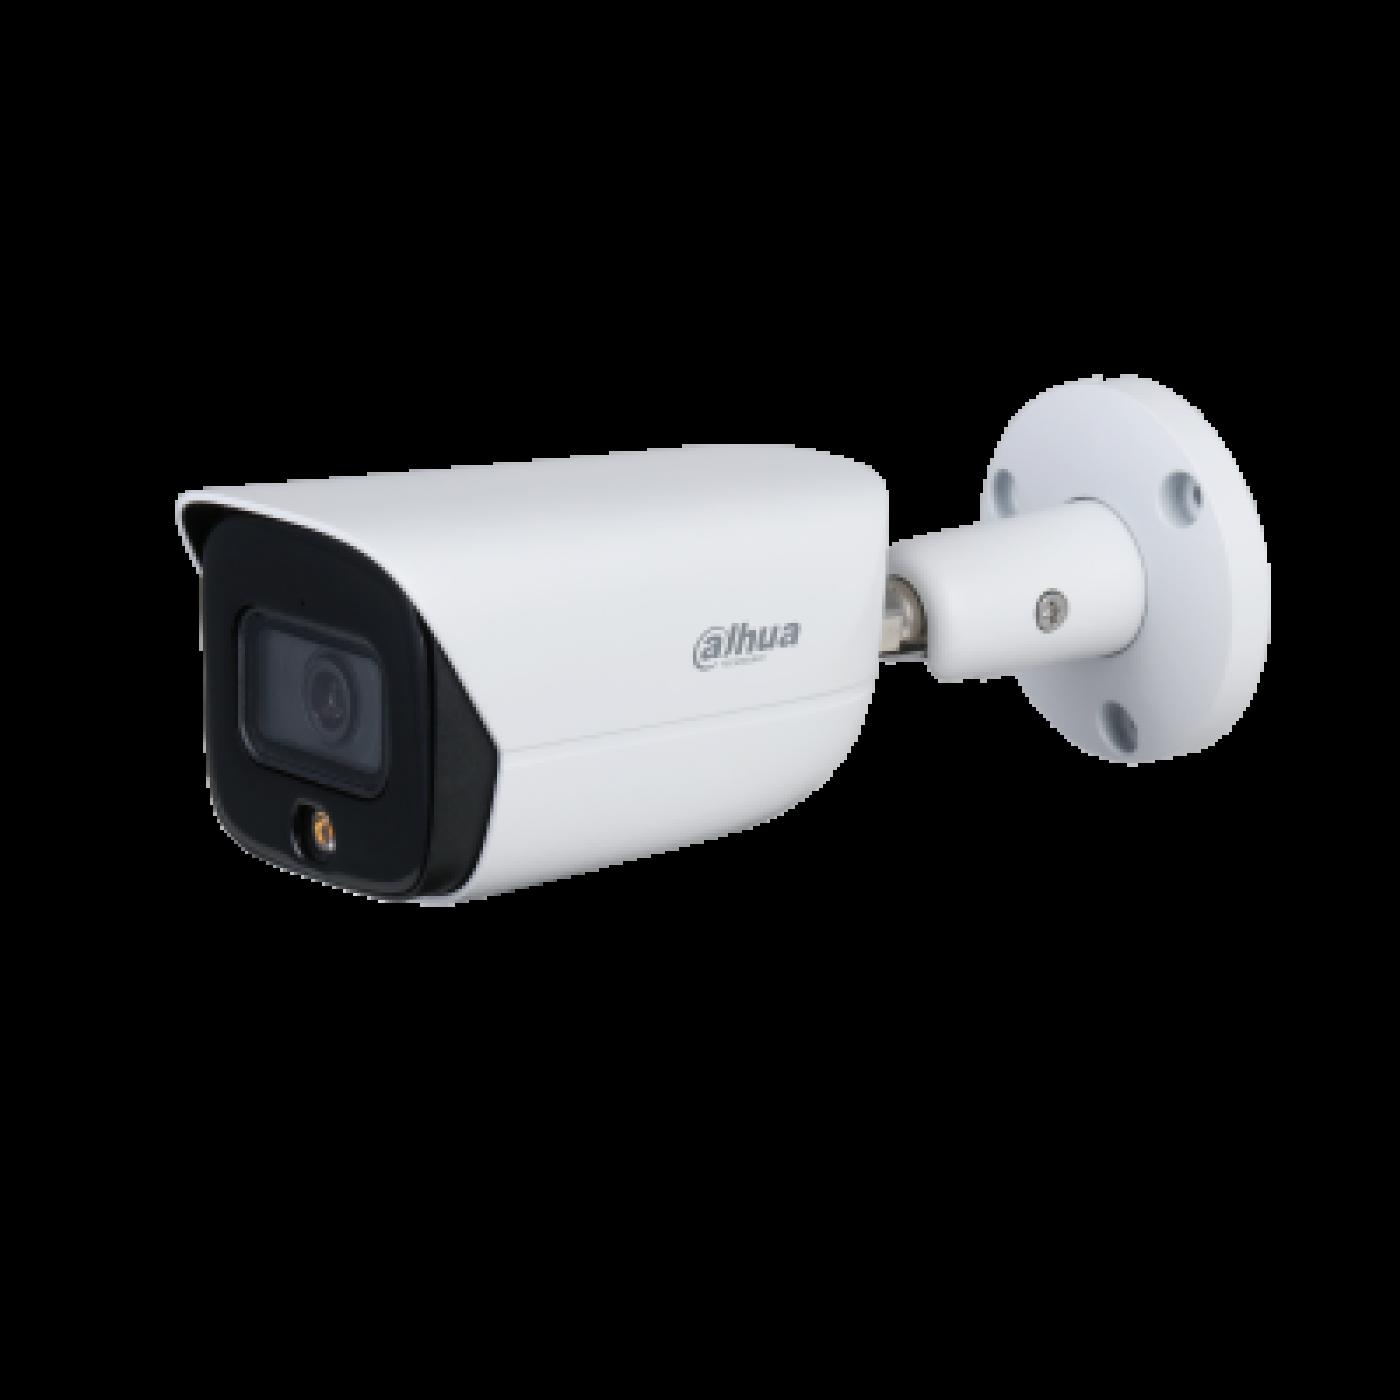 DH-IPC-HFW3249EP-AS-LED-0360B